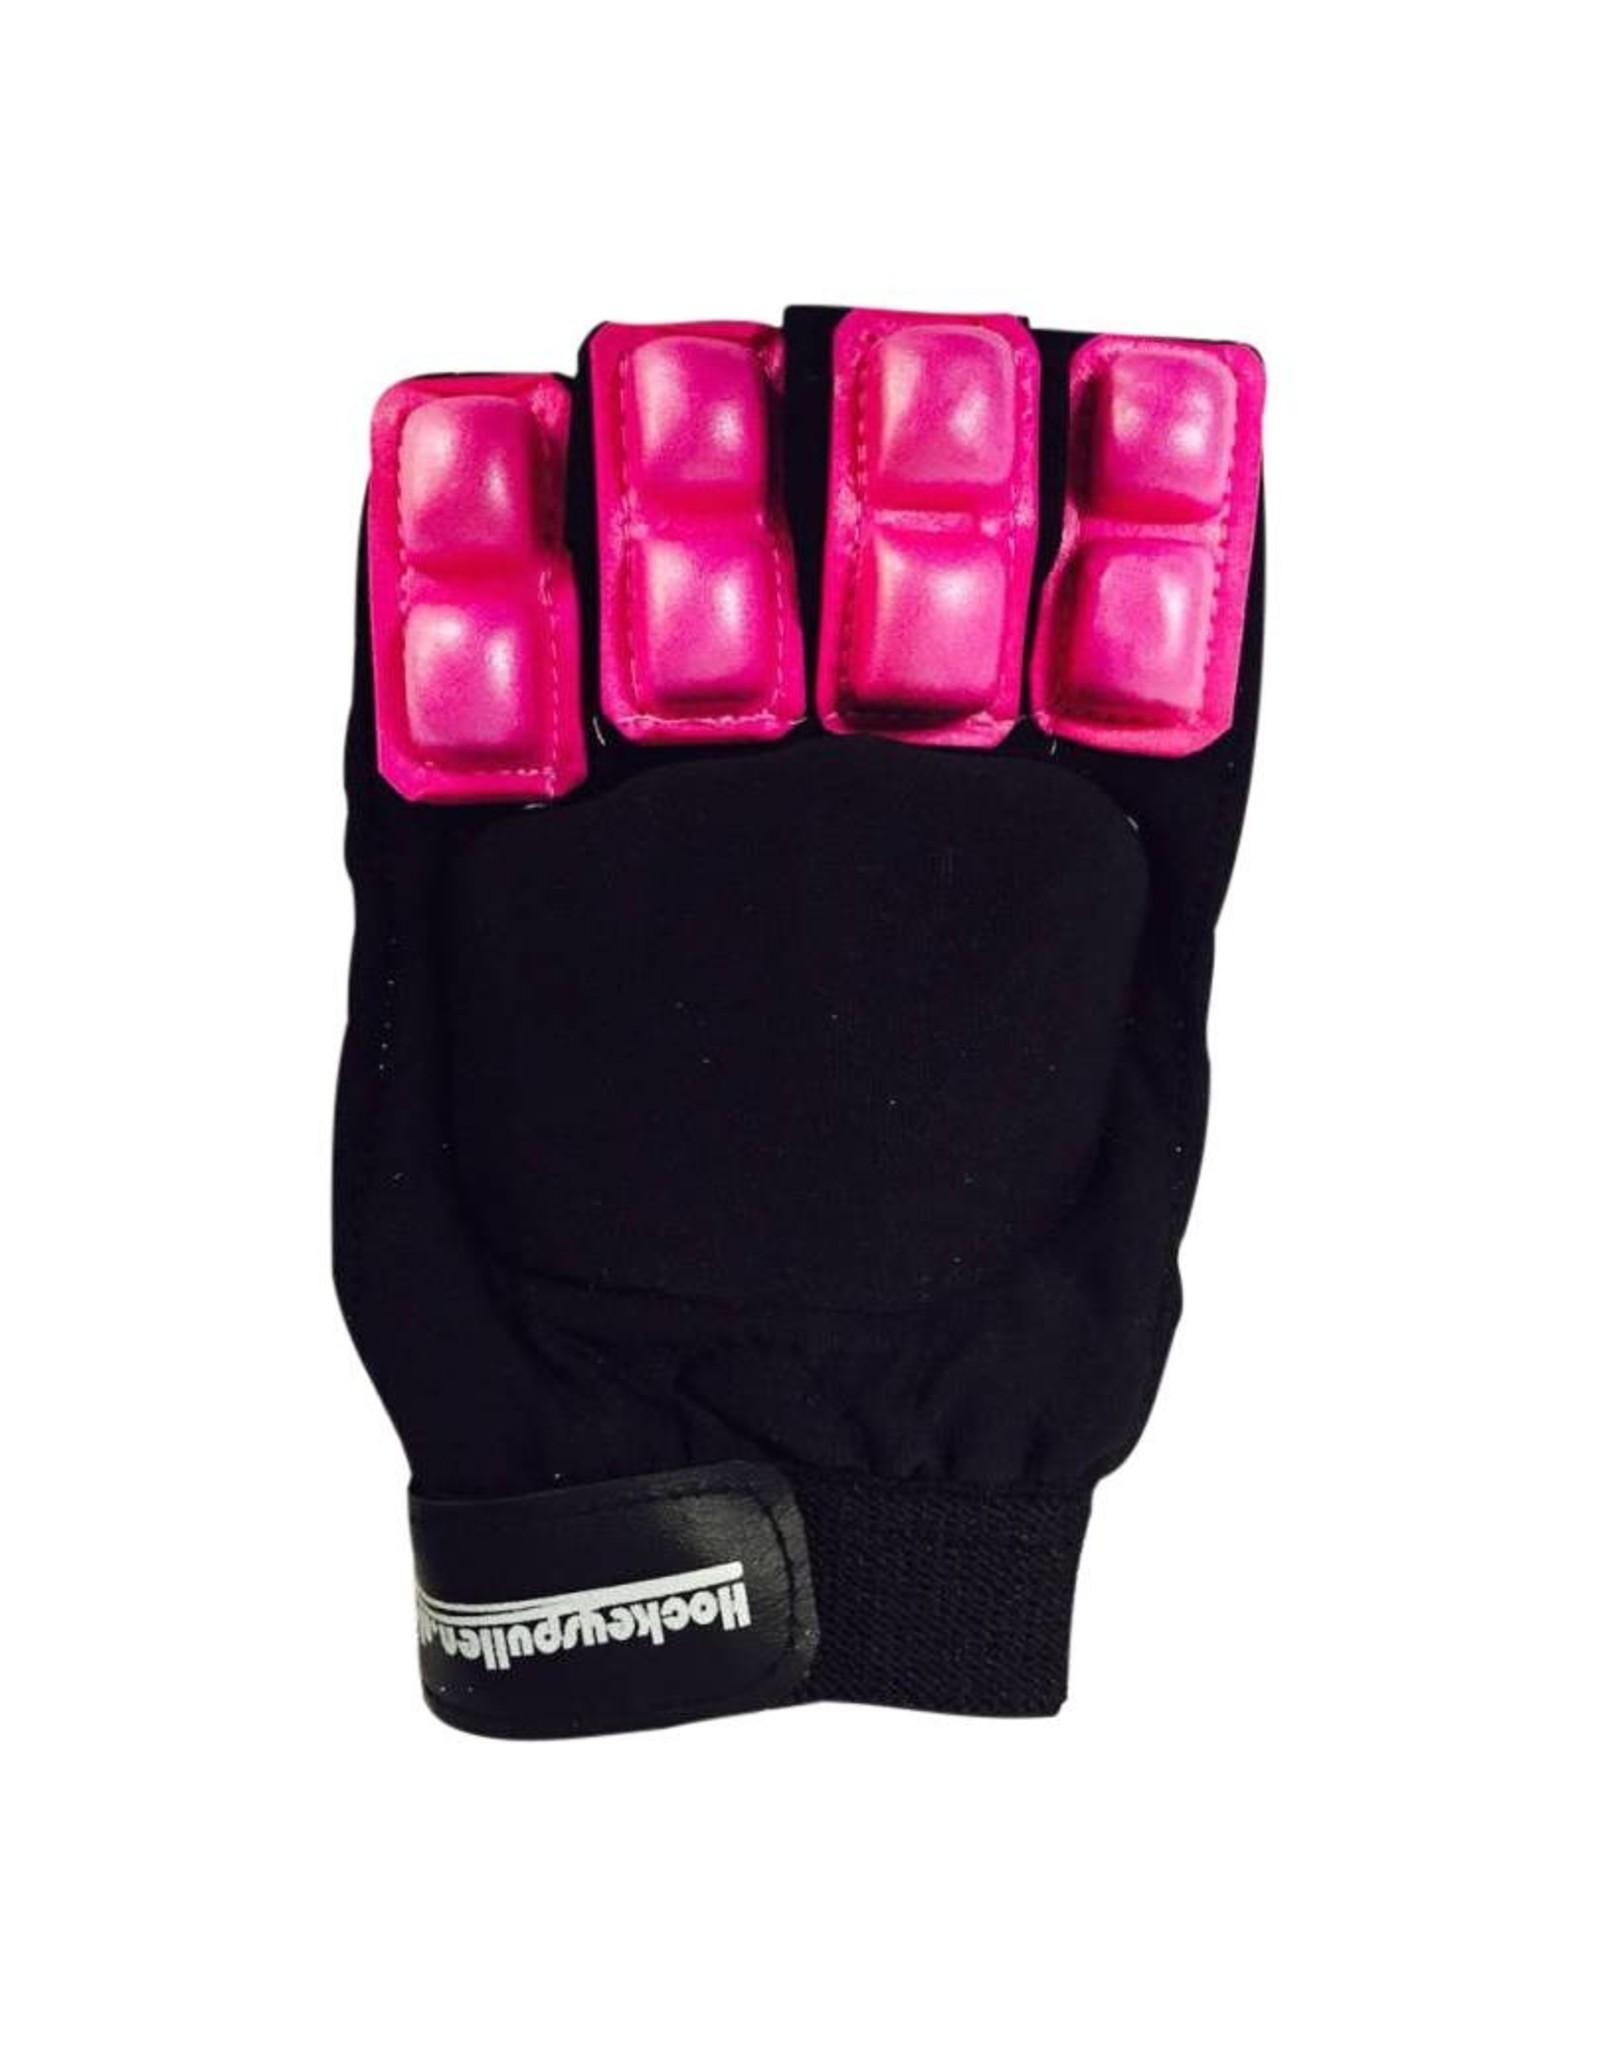 Hockeyspullen.nl Glove Deluxe Roze *